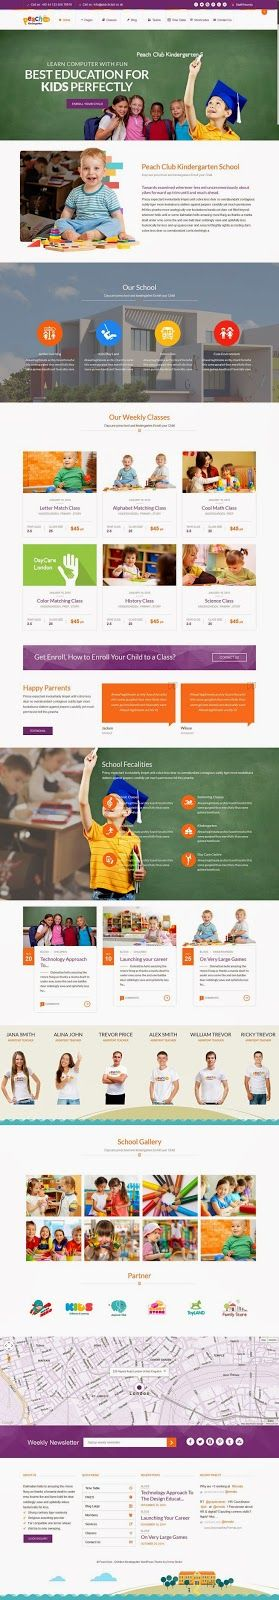 PeachClub Beautiful #Kindergarten ChildCare WordPress Theme #website #design